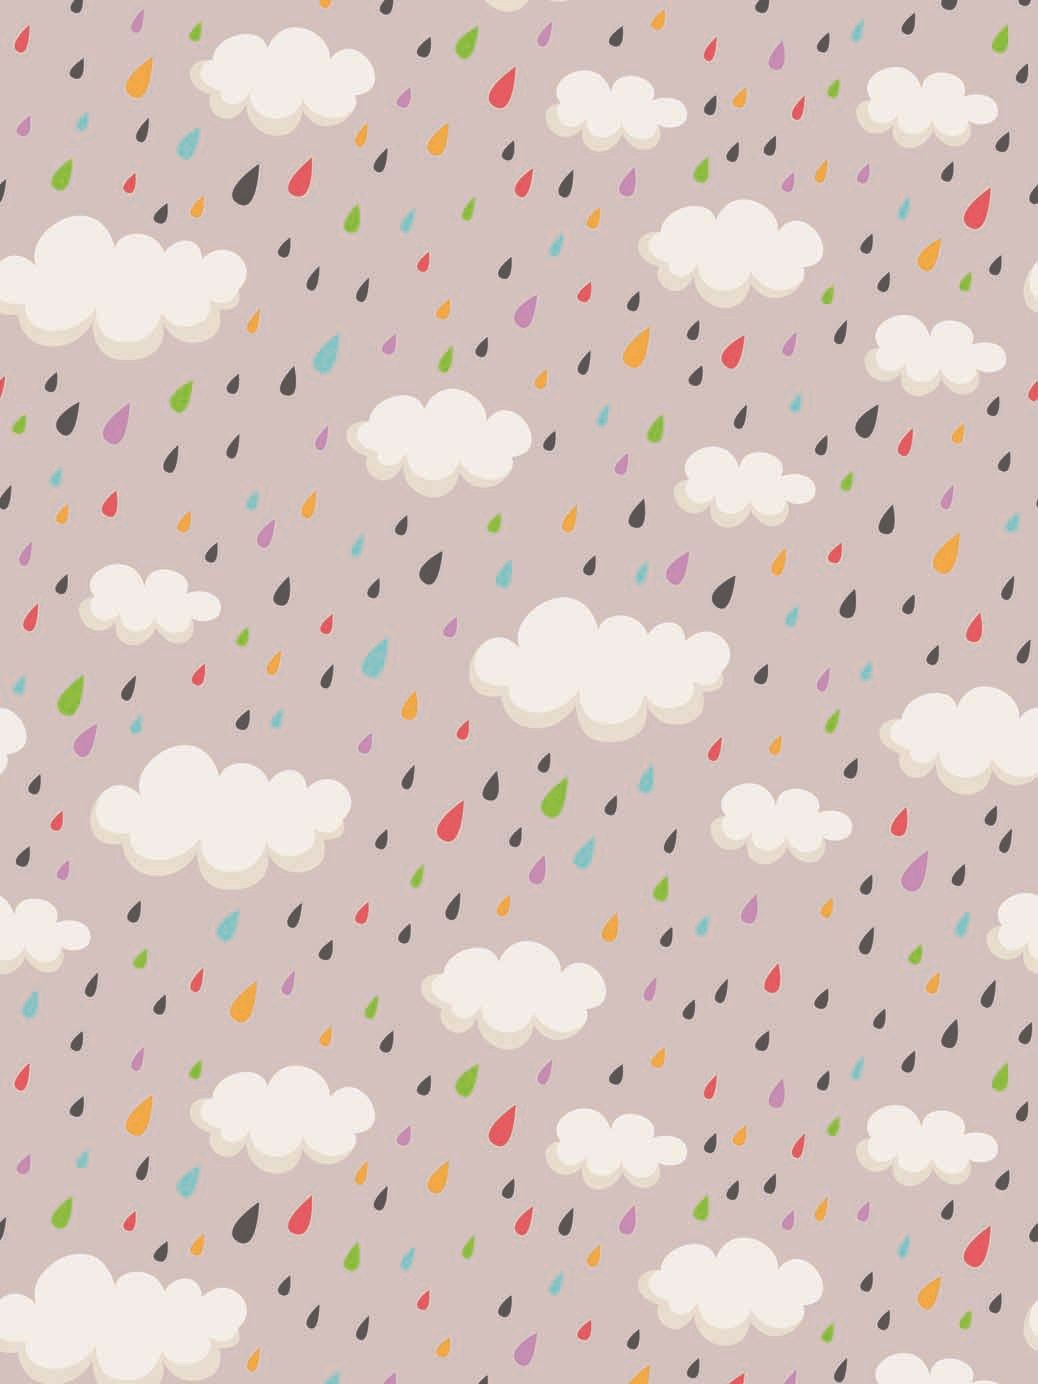 Find More Background Information About Life Magic Box 10x20 Backdrop Photo Shoot Background Fundo Fotogr Vinyl Backdrops Photography Backdrops Newborn Backdrop